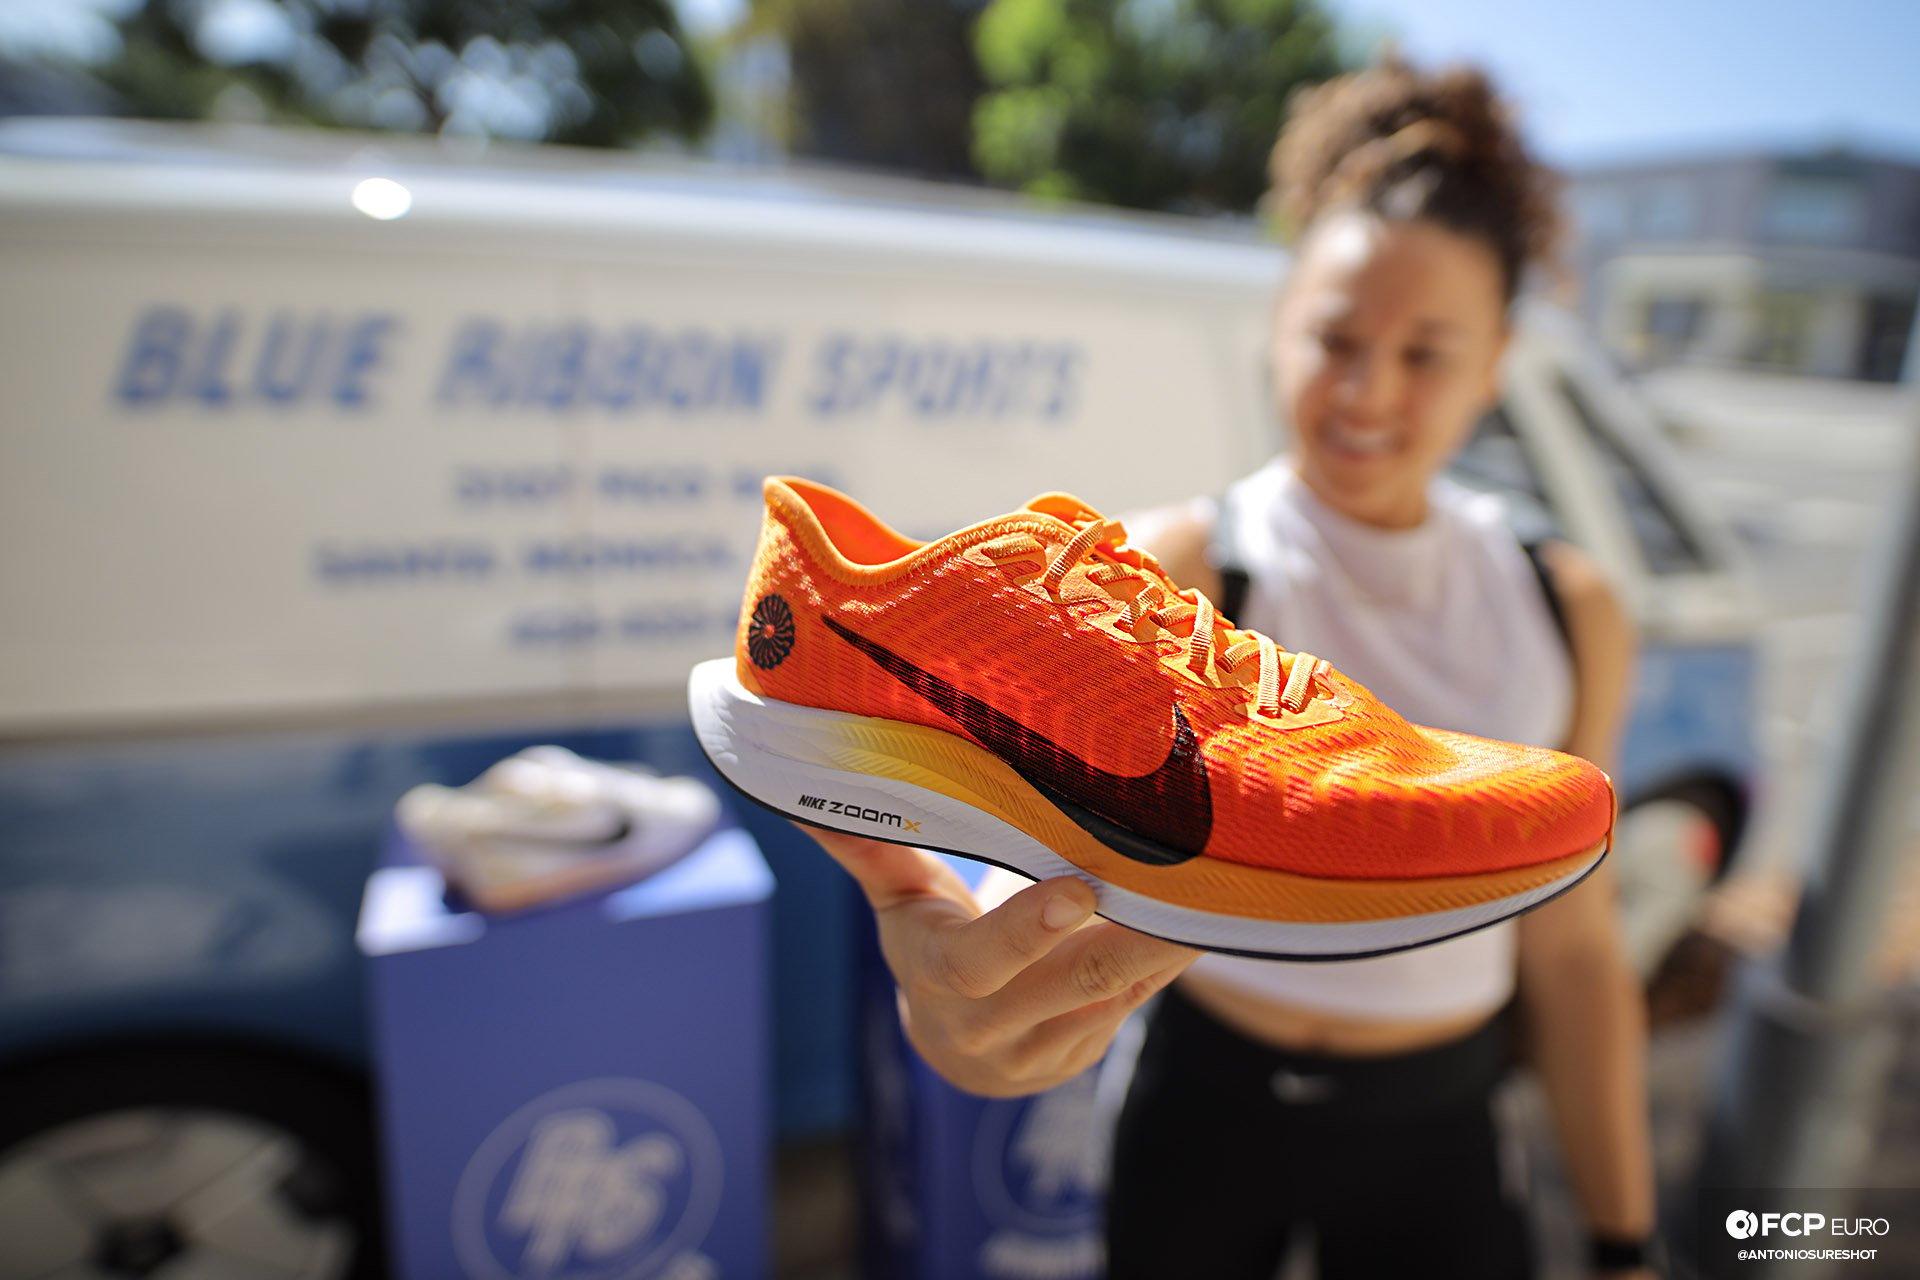 Nike Blue Ribbon Sports Santa Monica Phil Knight EOSR9123